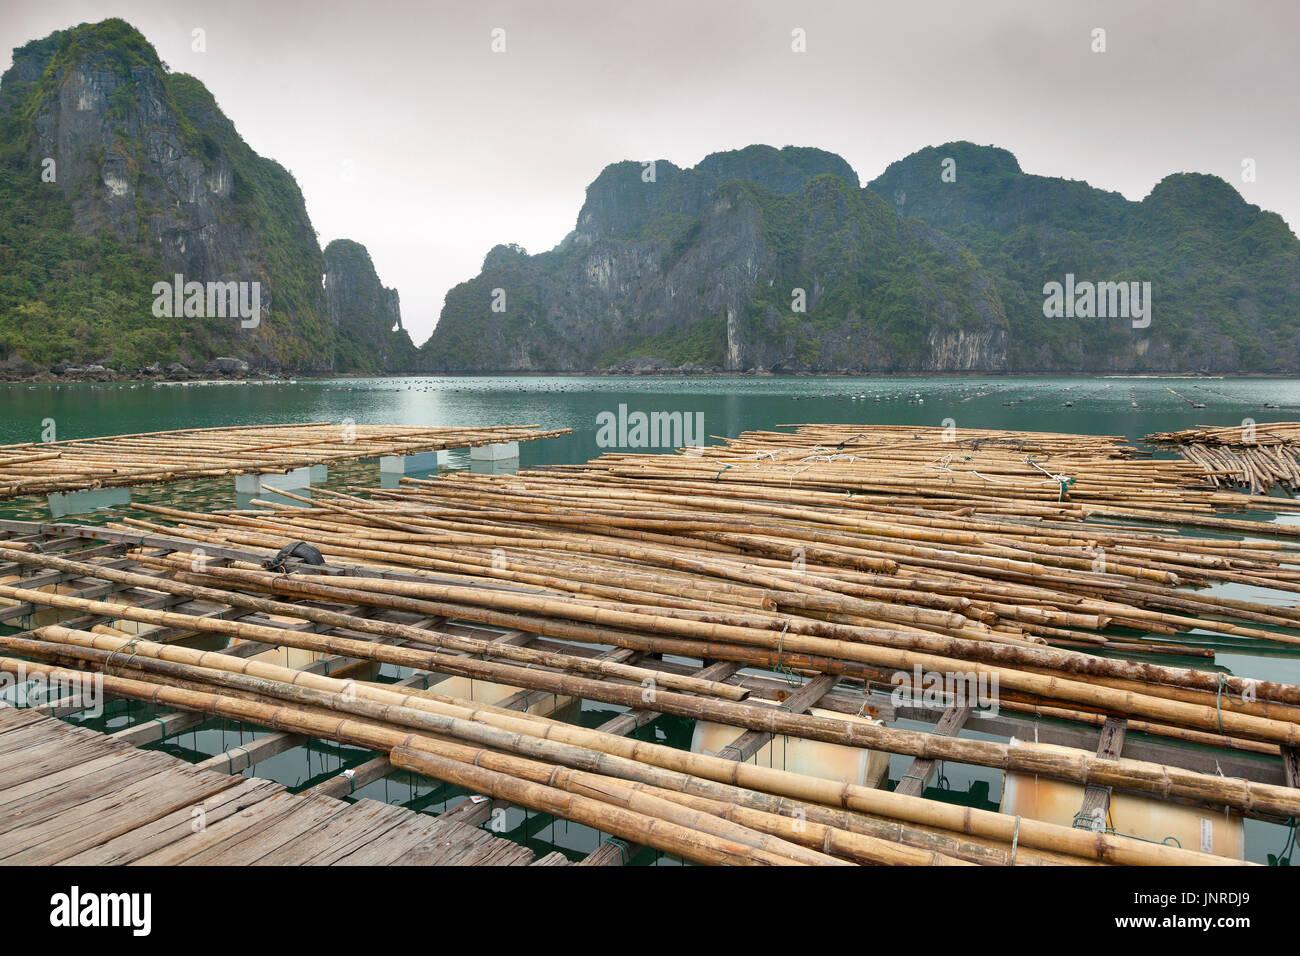 Halong Bay, Vietnam, pearl farm infrastructure Stock Photo